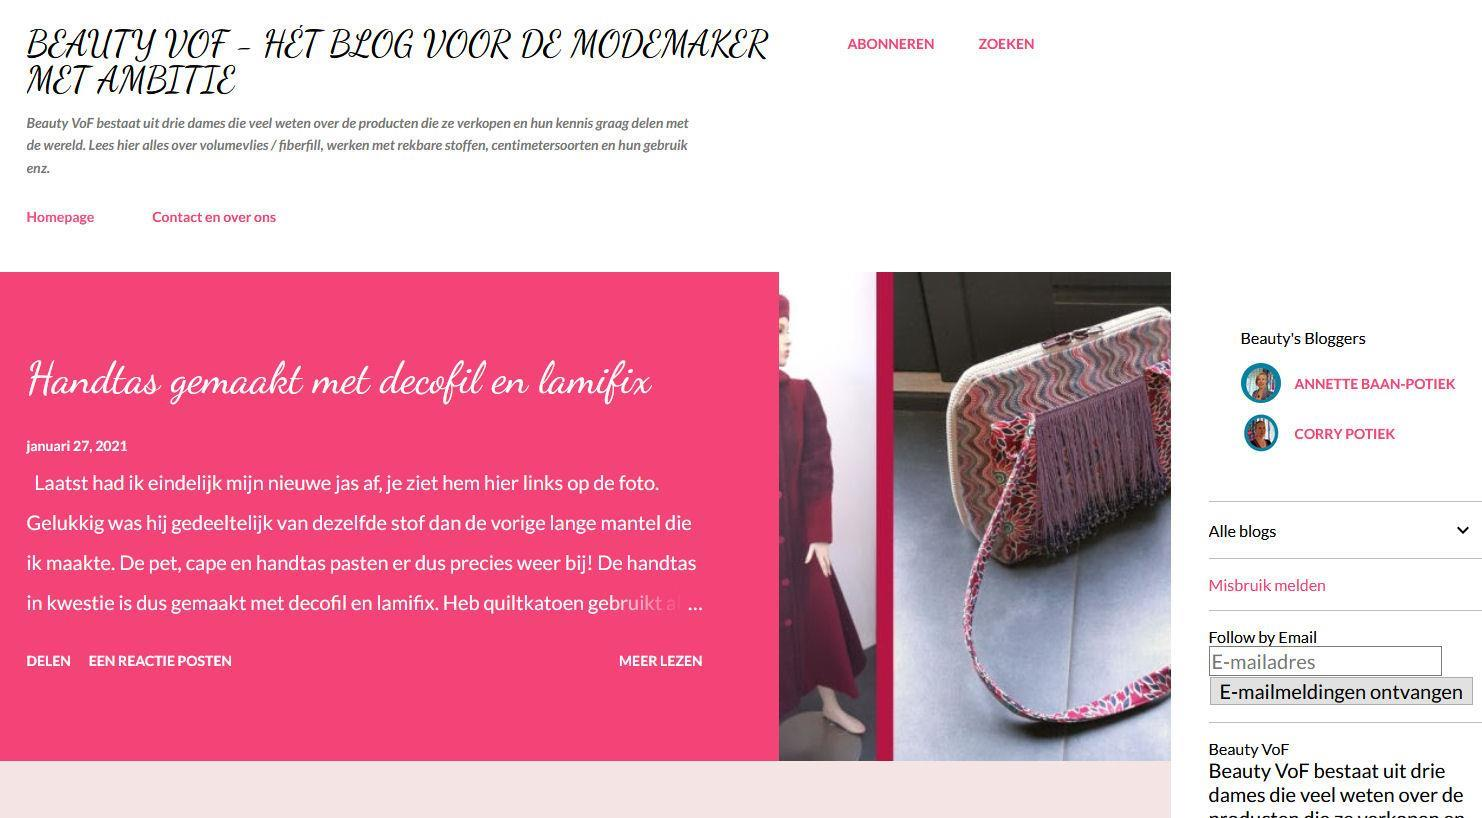 Beauty's Blog